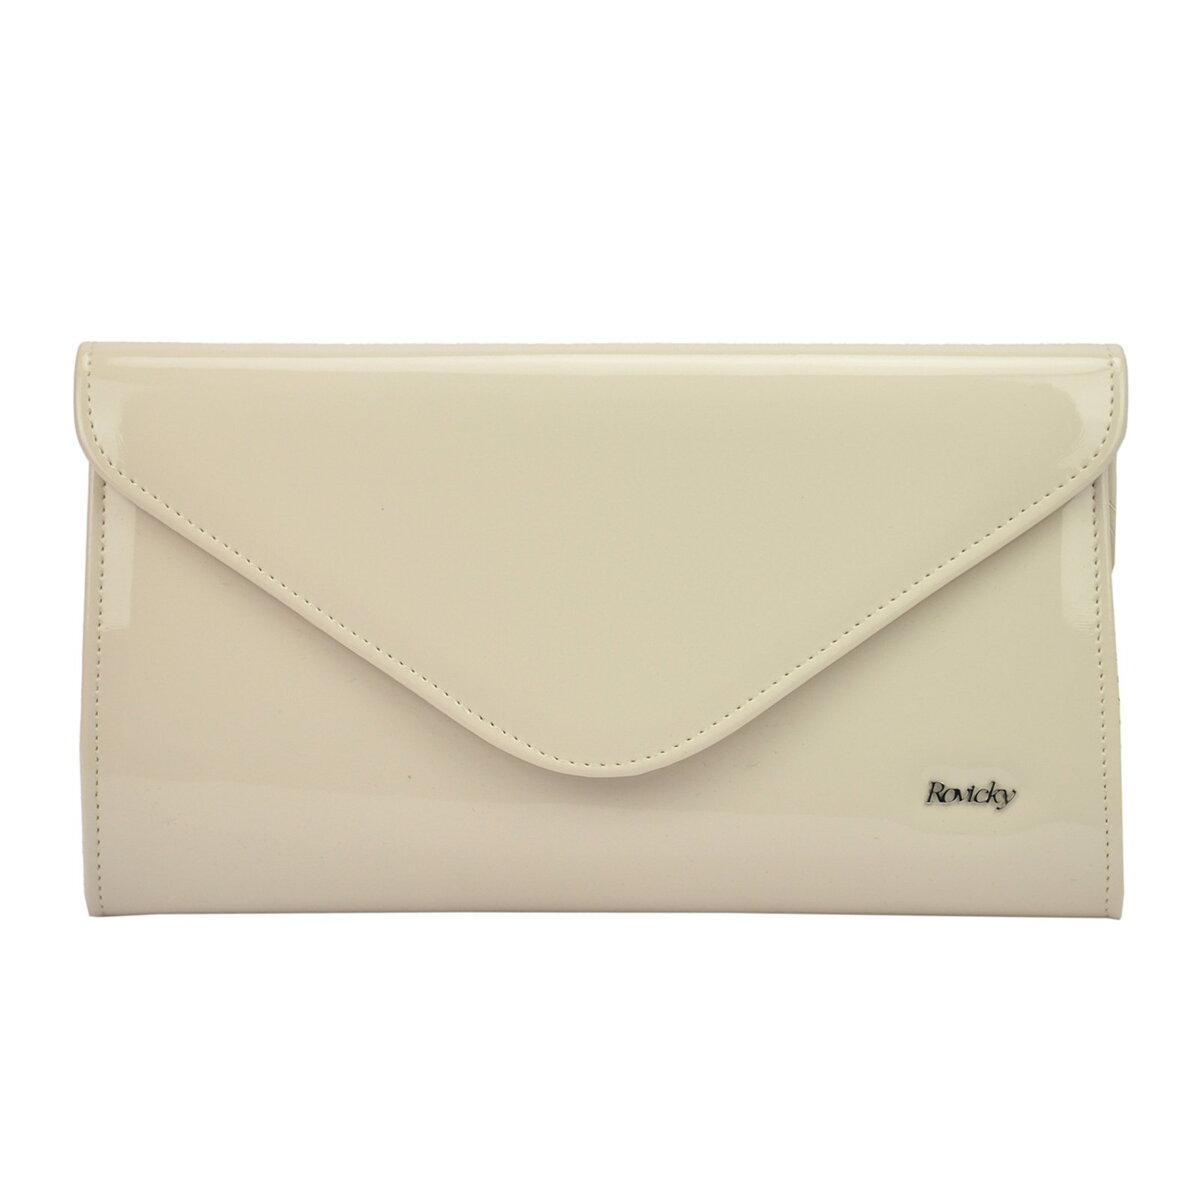 7820e5b9c45b1 Dámska kabelka do ruky Rovicky W25-L